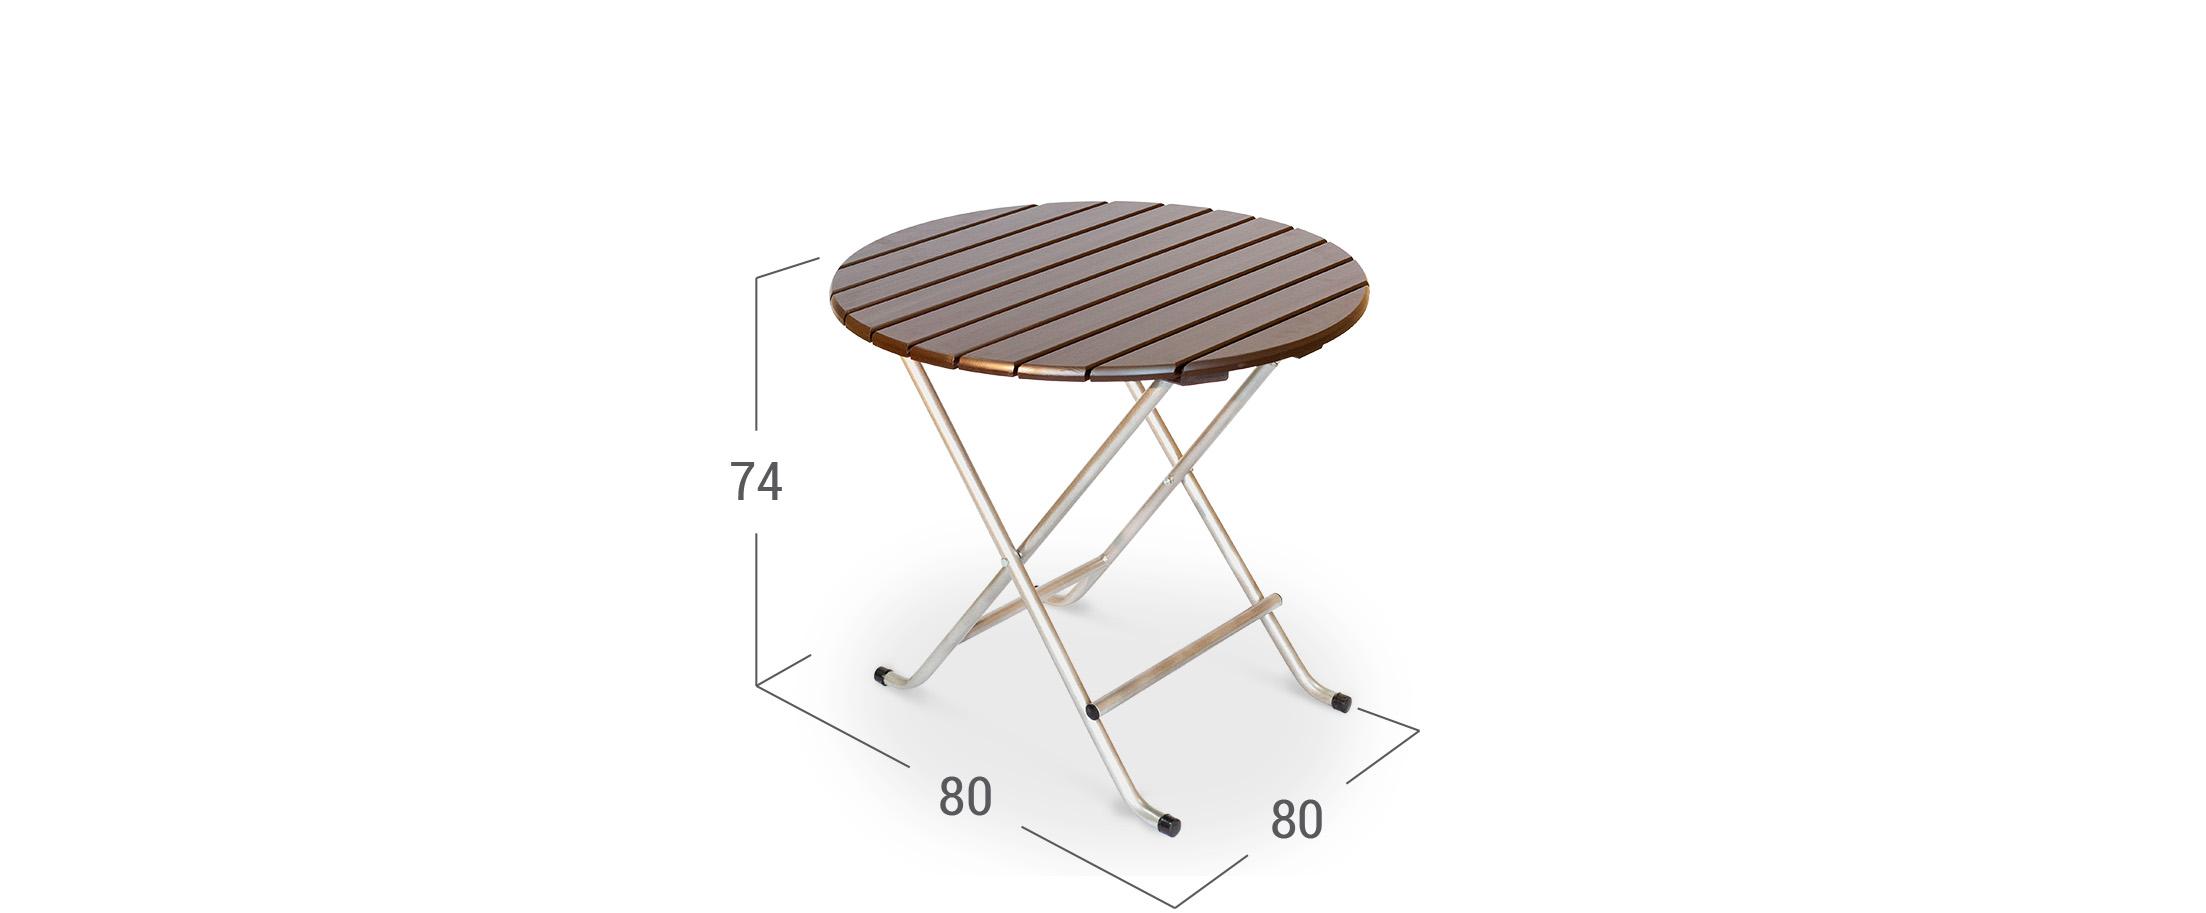 Стол складной Вишня Модель 578